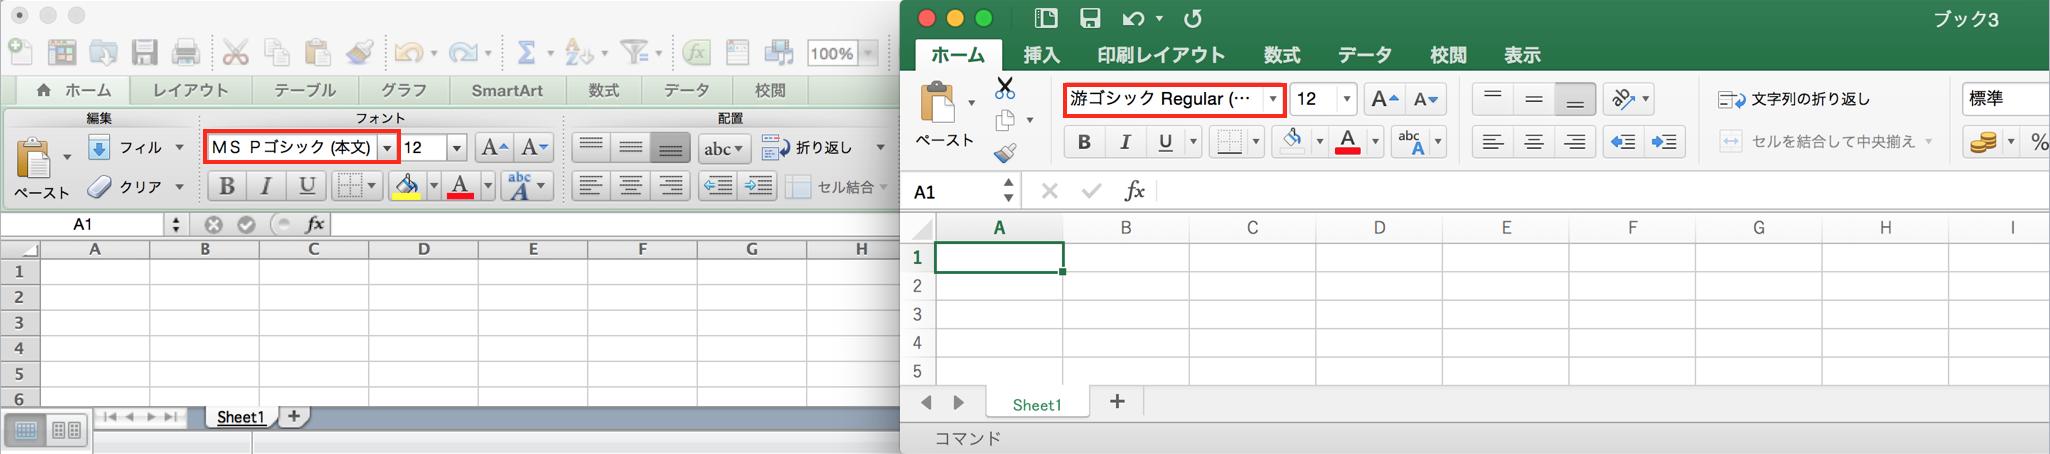 Excel2016とExcel2011のデフォルトフォント